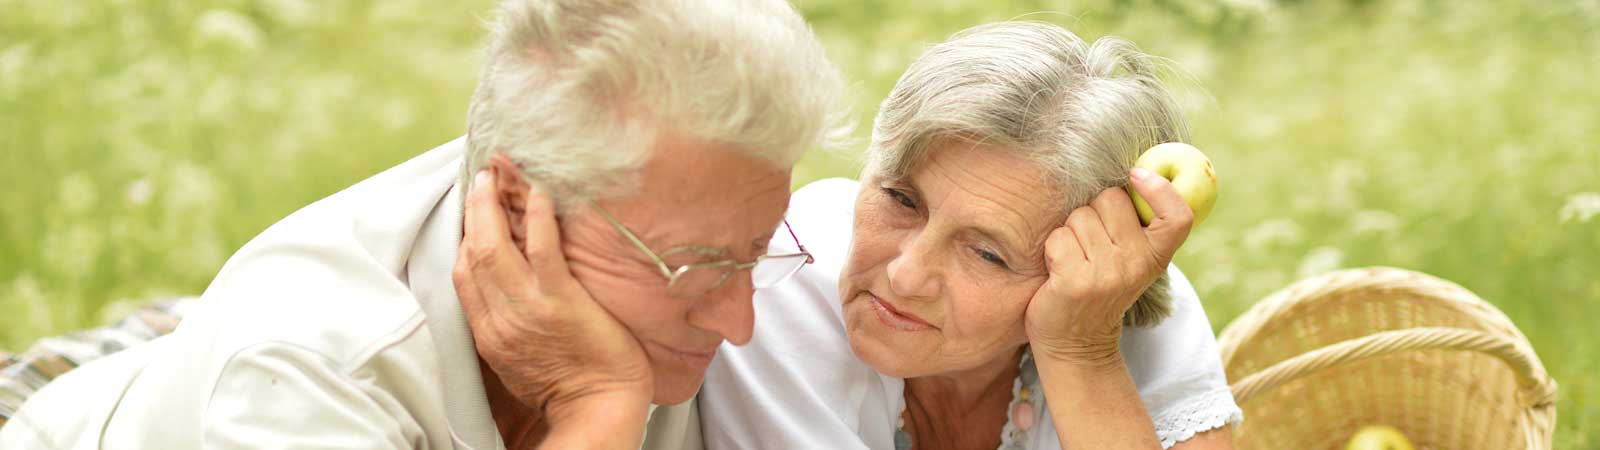 Senior couple posing for the camera